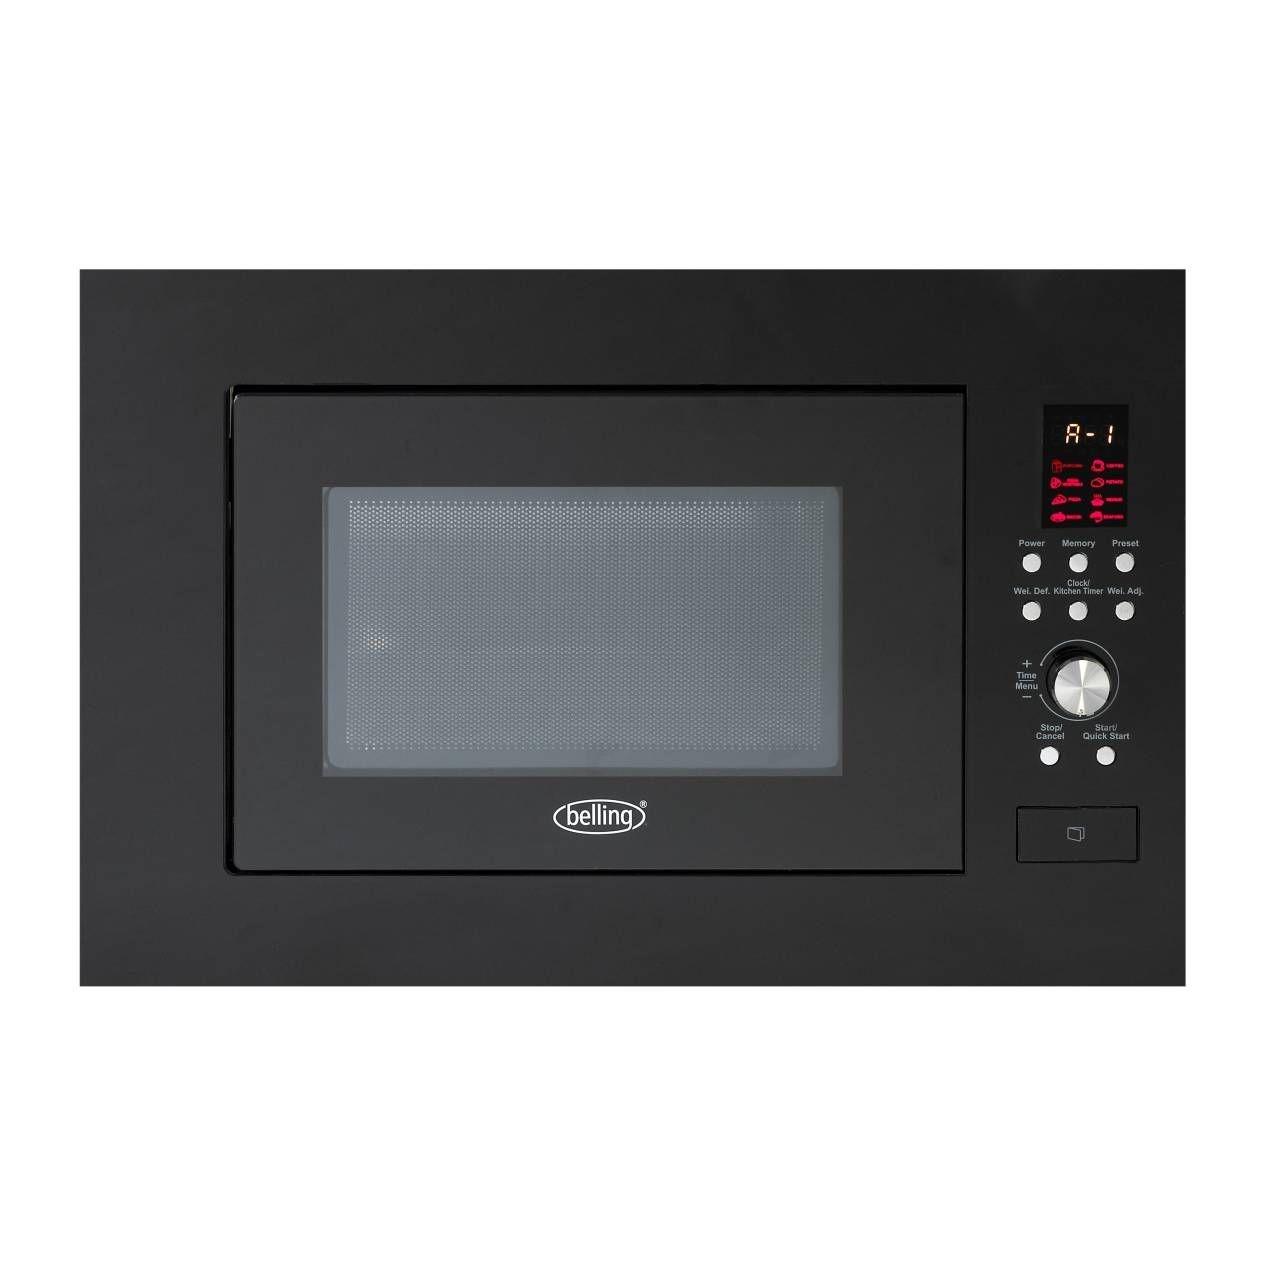 Belling BIM60BLK 23L Built In Microwave-Black *NI & ROI ONLY*